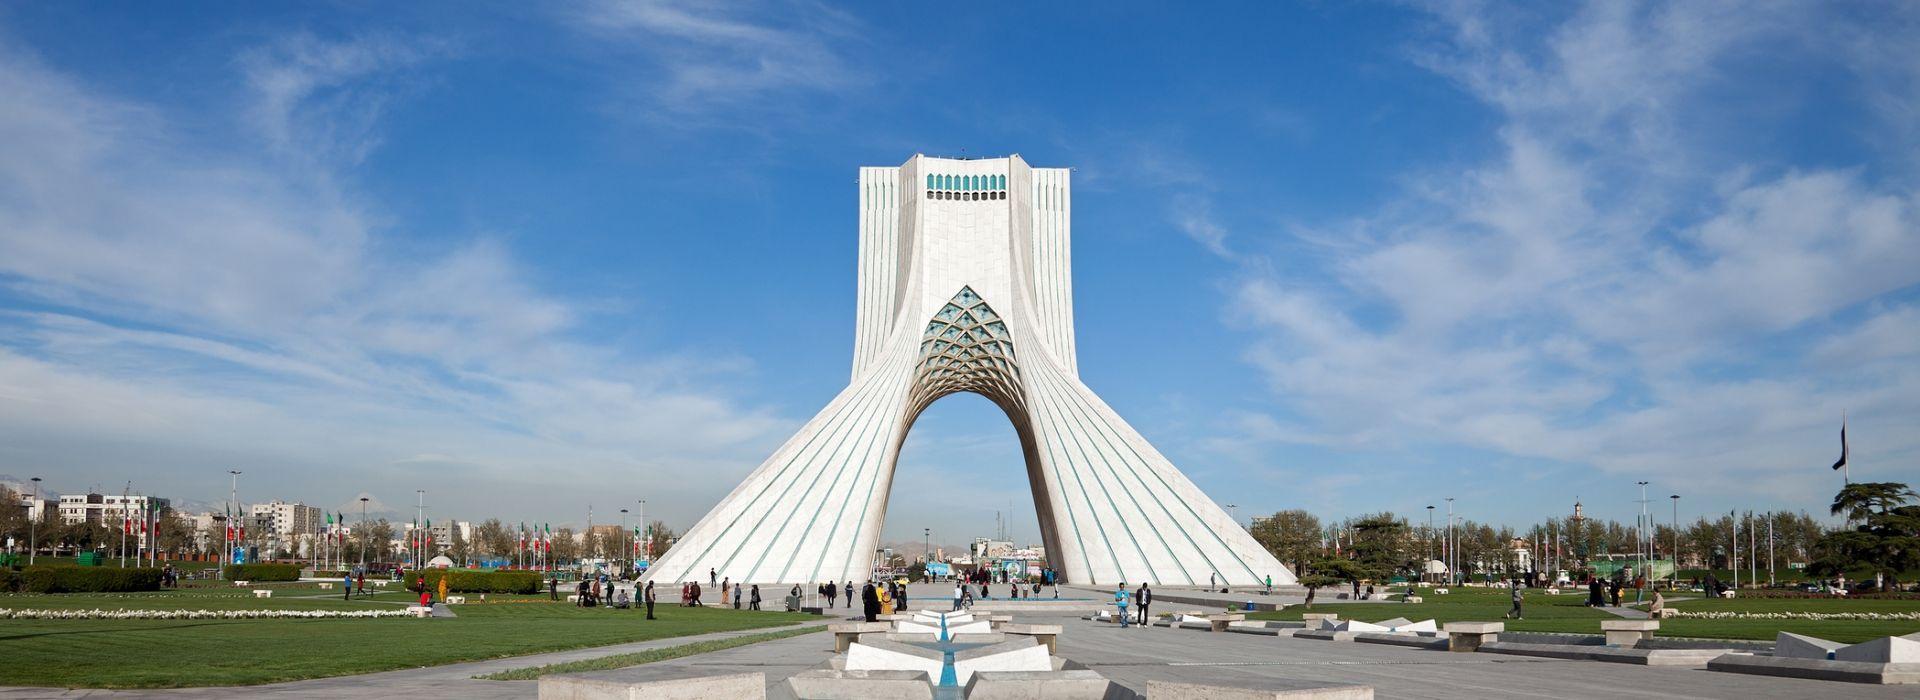 Food tours in Iran